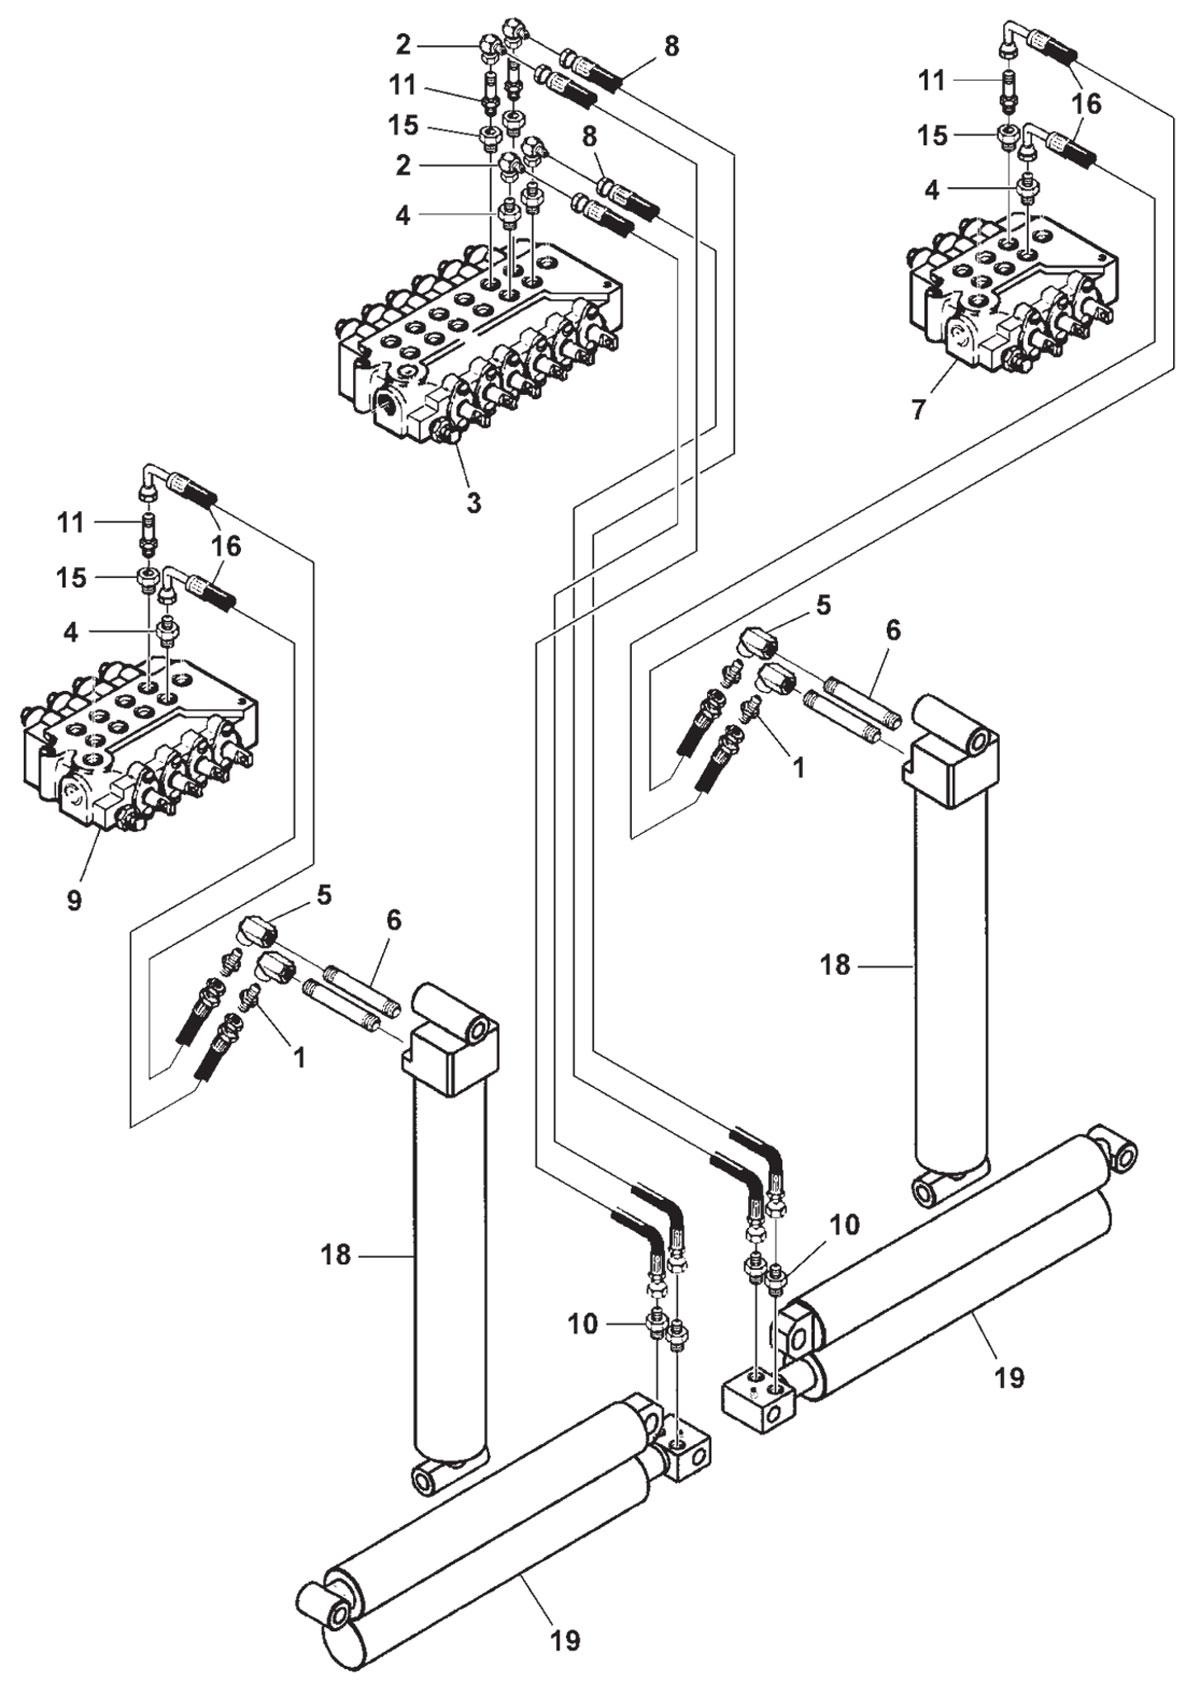 hydraulic schematics diagram trailer out riggers